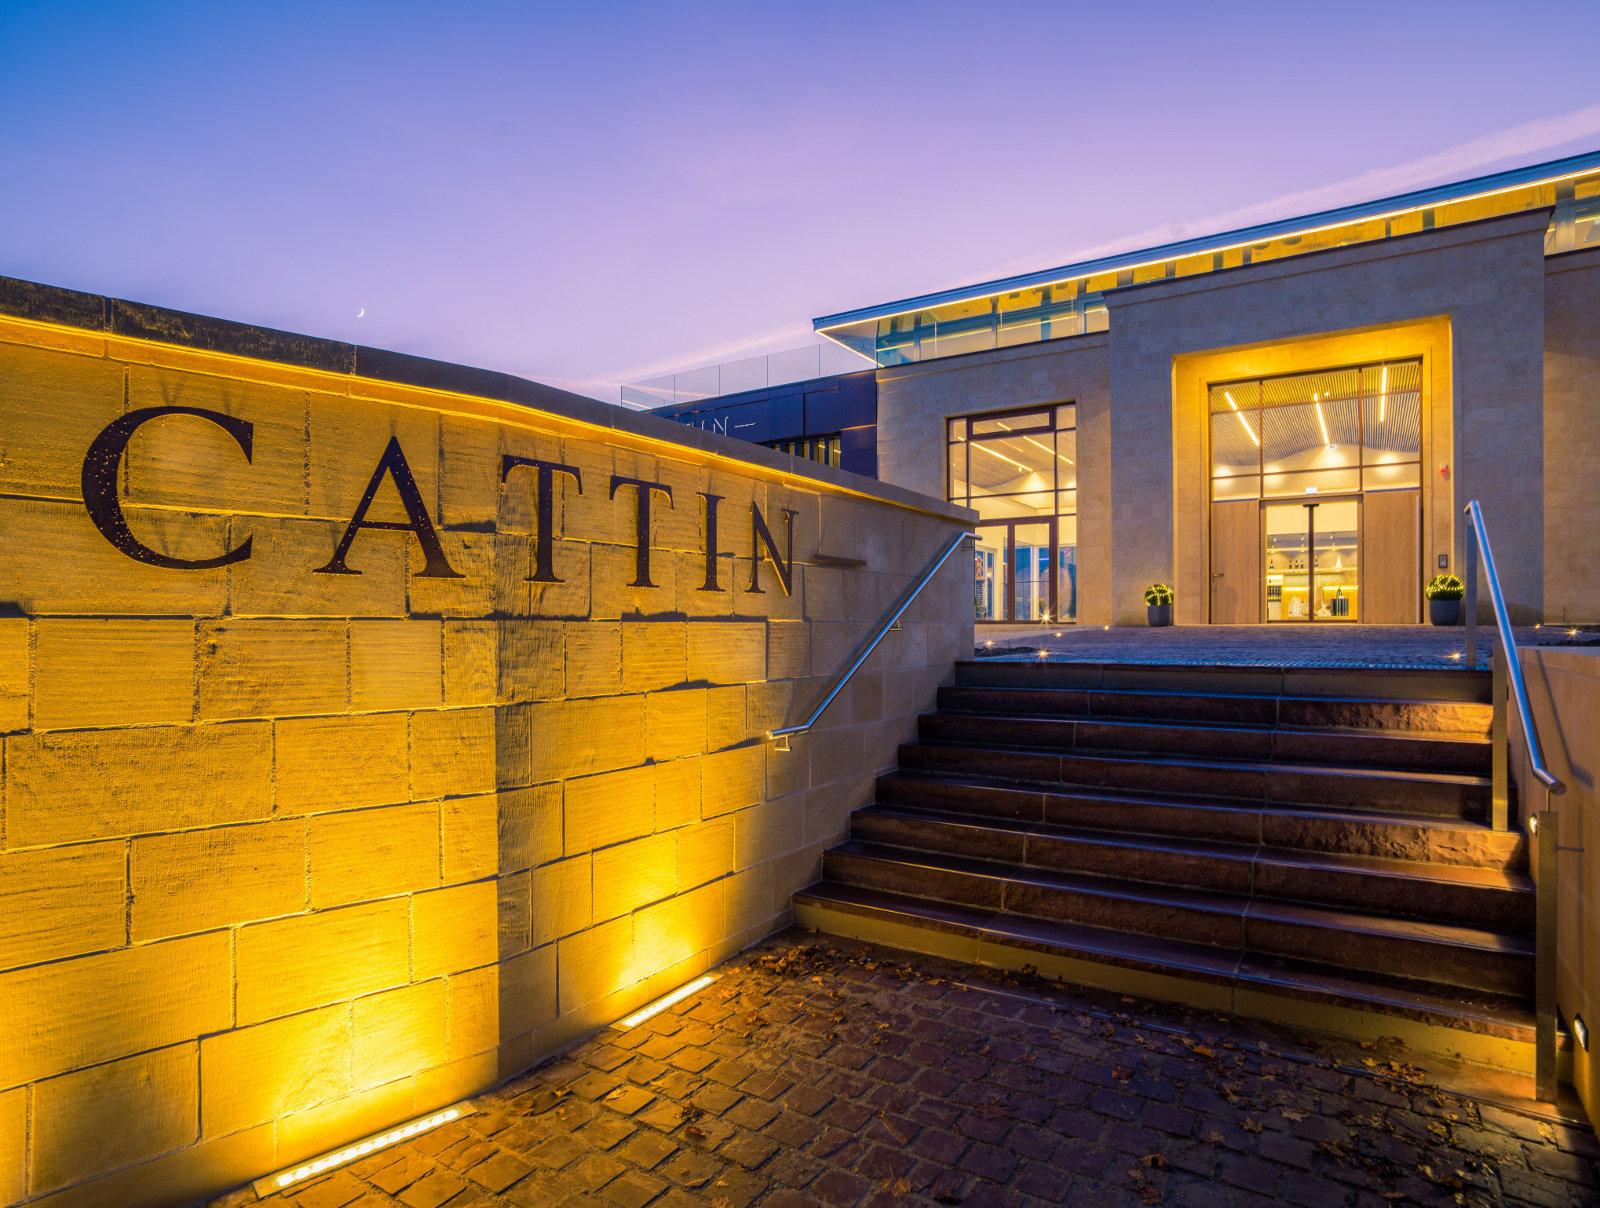 © Voegtlinshoffen-Maison Joseph Cattin